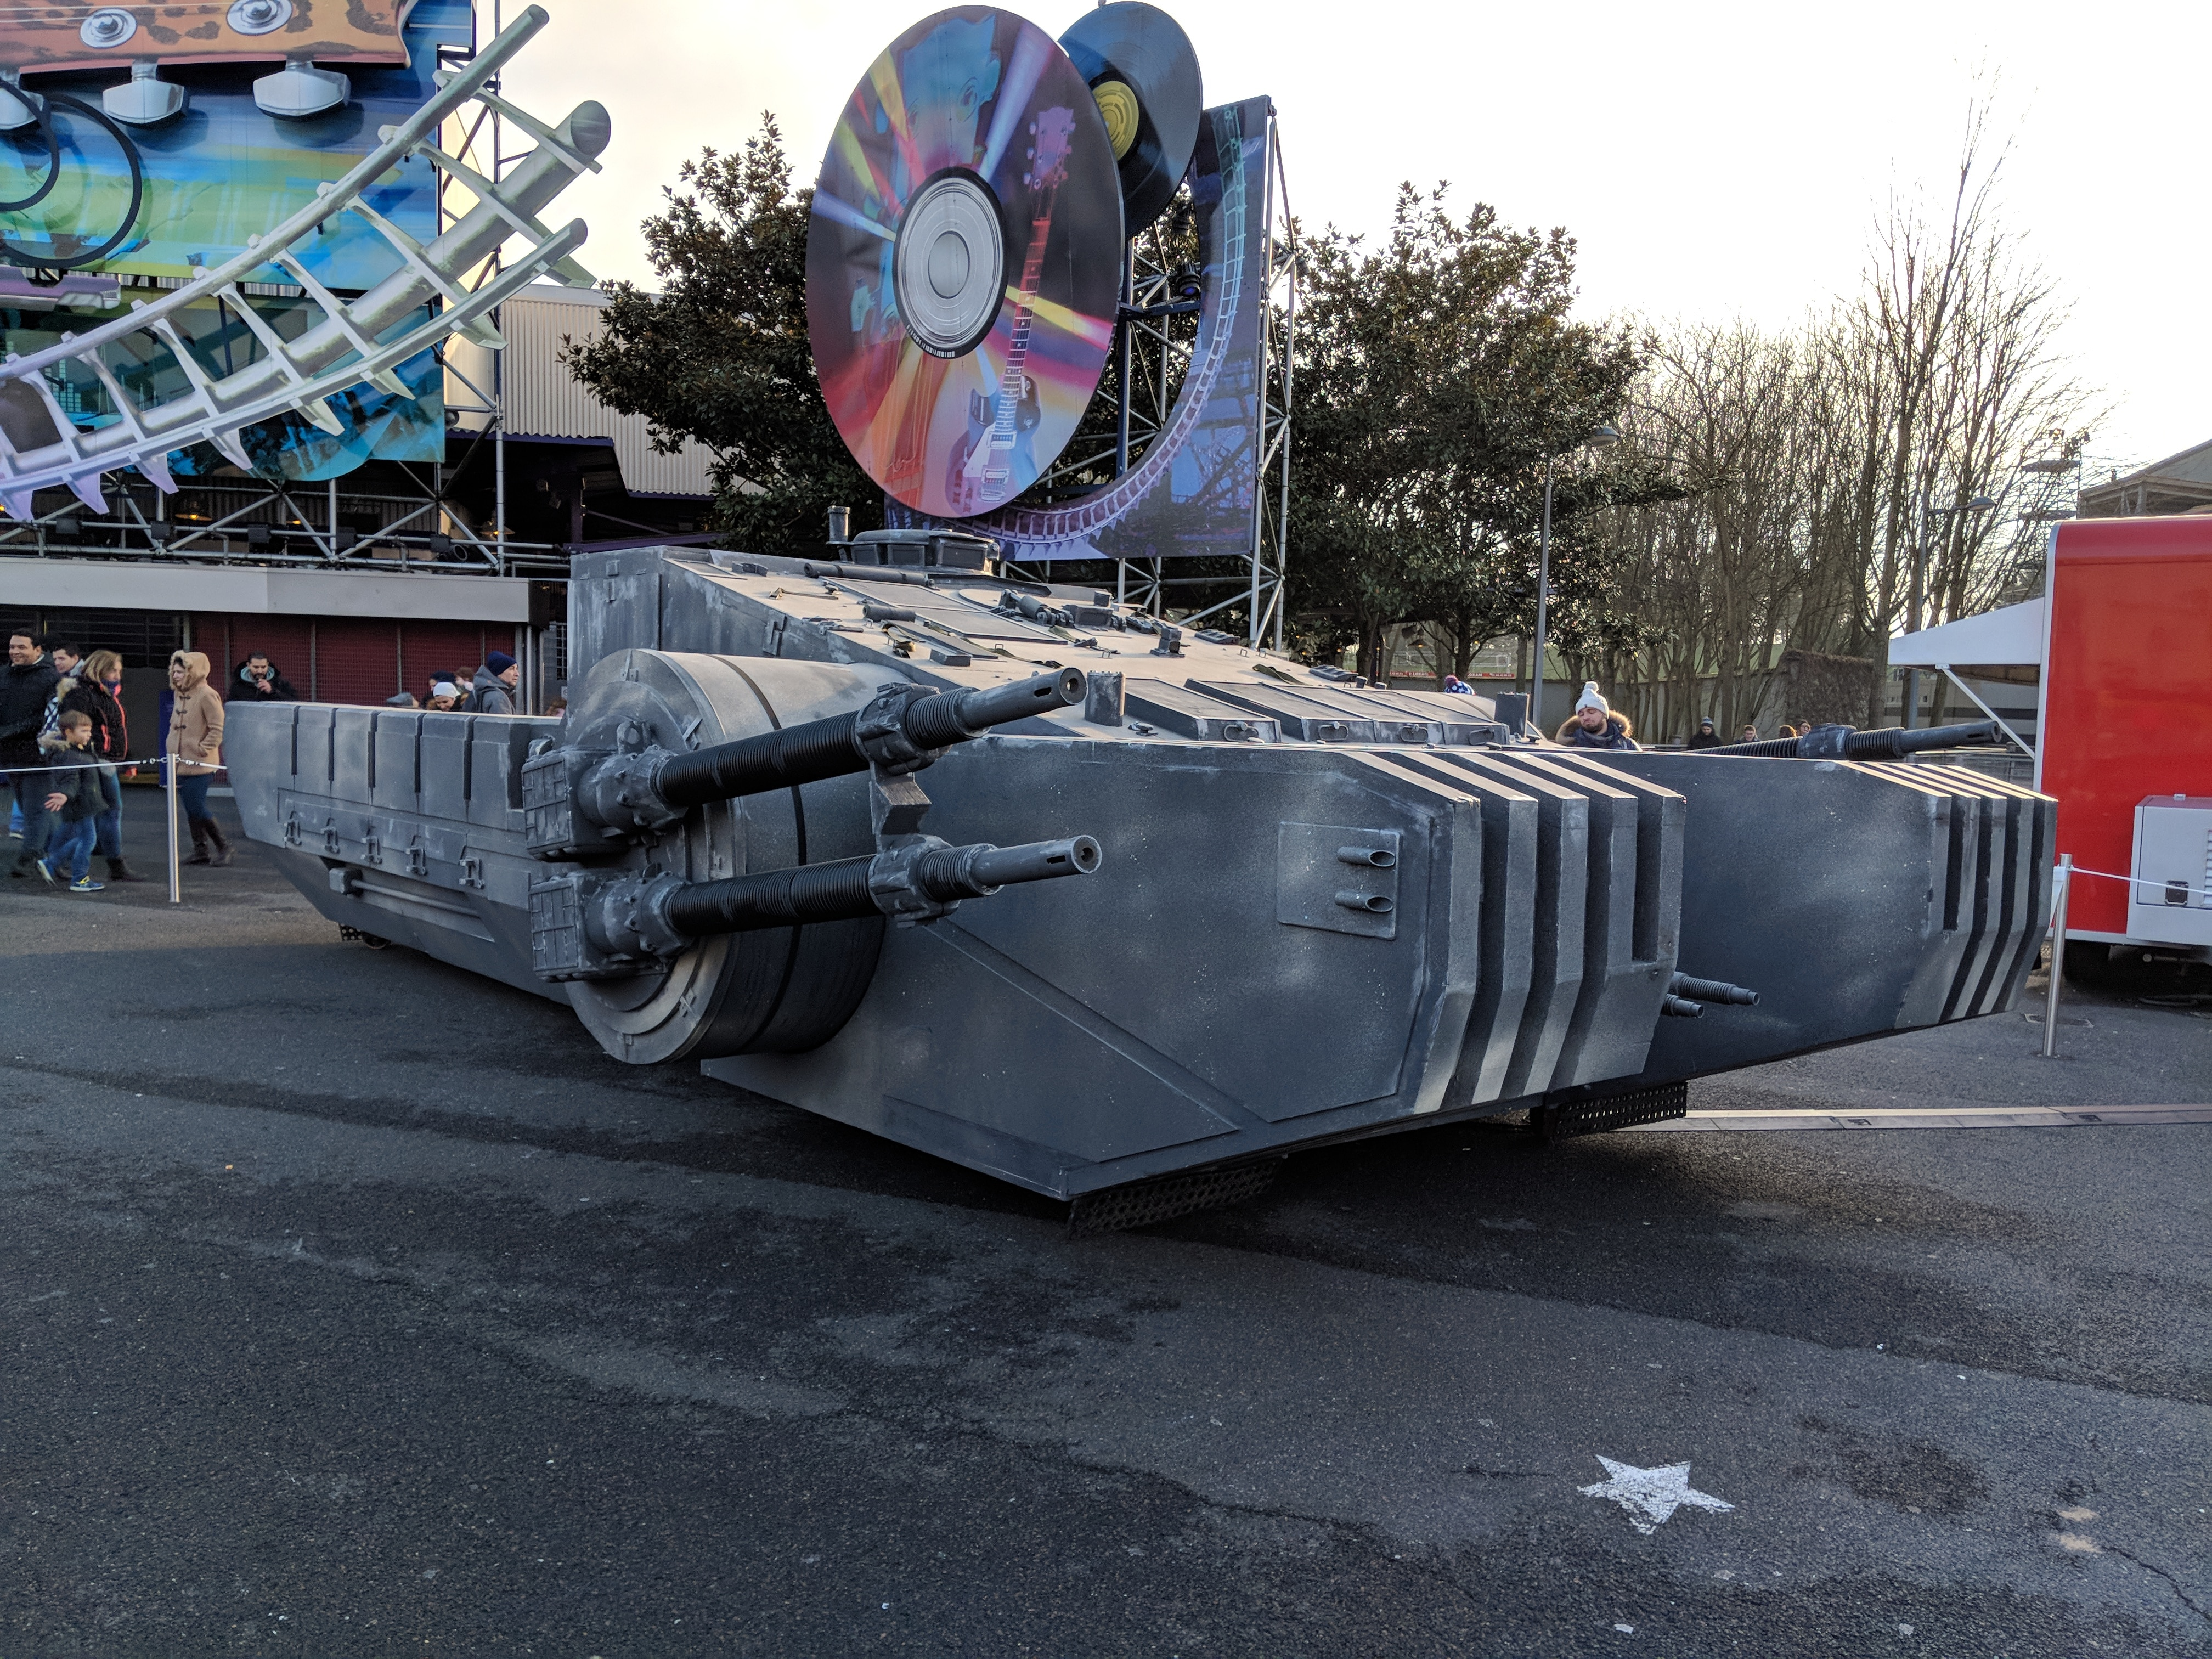 Disneyland Paris - Season of the Force 2018 - Combat Assault Tank